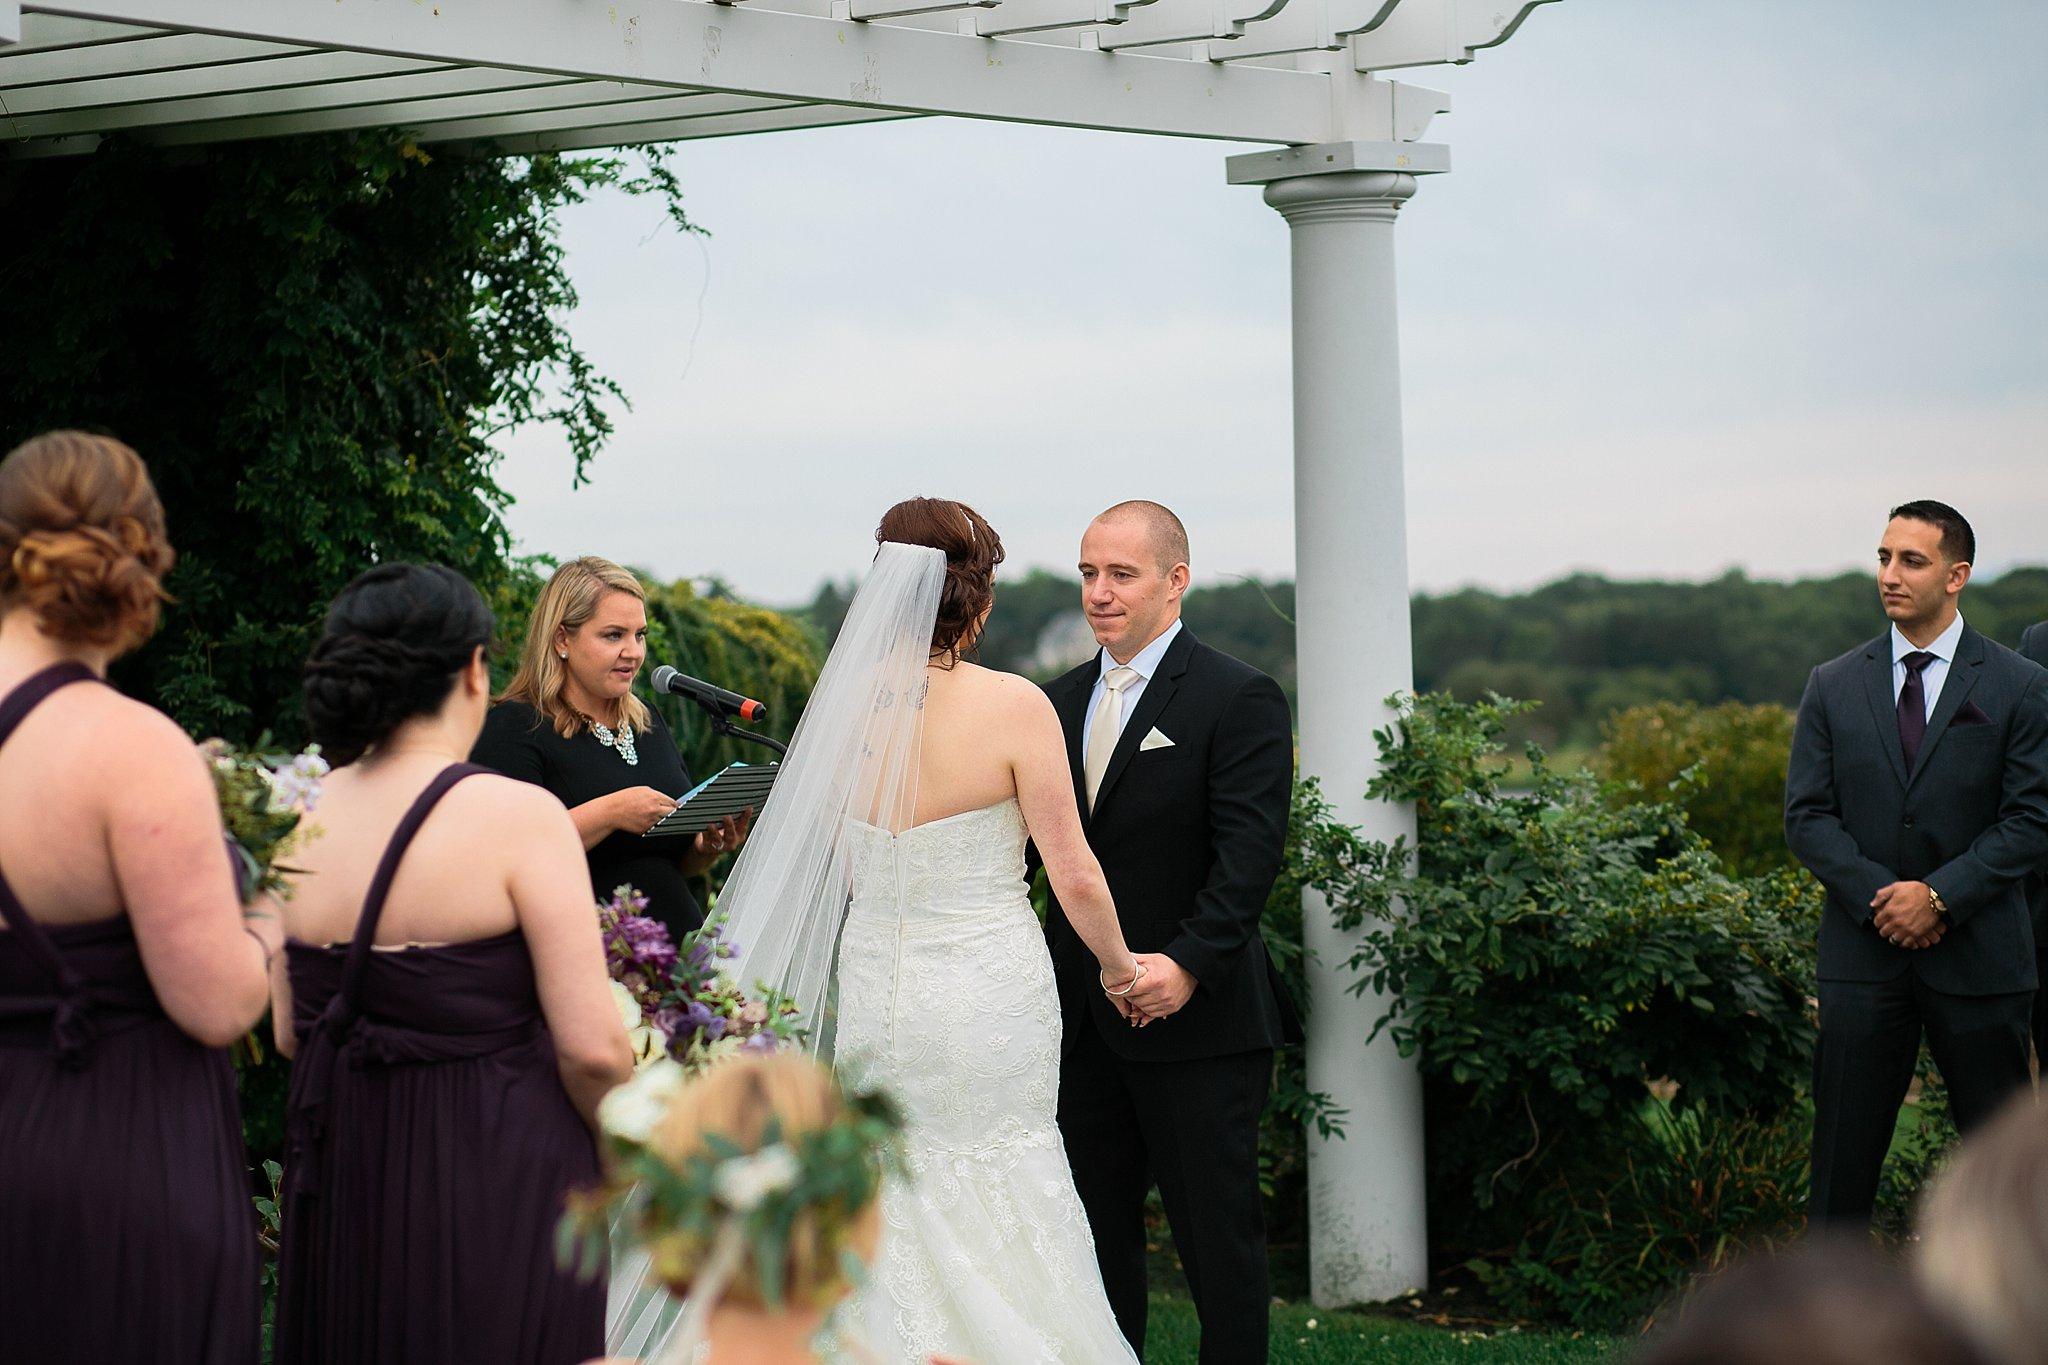 Links at Unionvale Wedding Lagrangeville Wedding Hudson Valley Wedding Photographer Sweet Alice Photography37.jpg